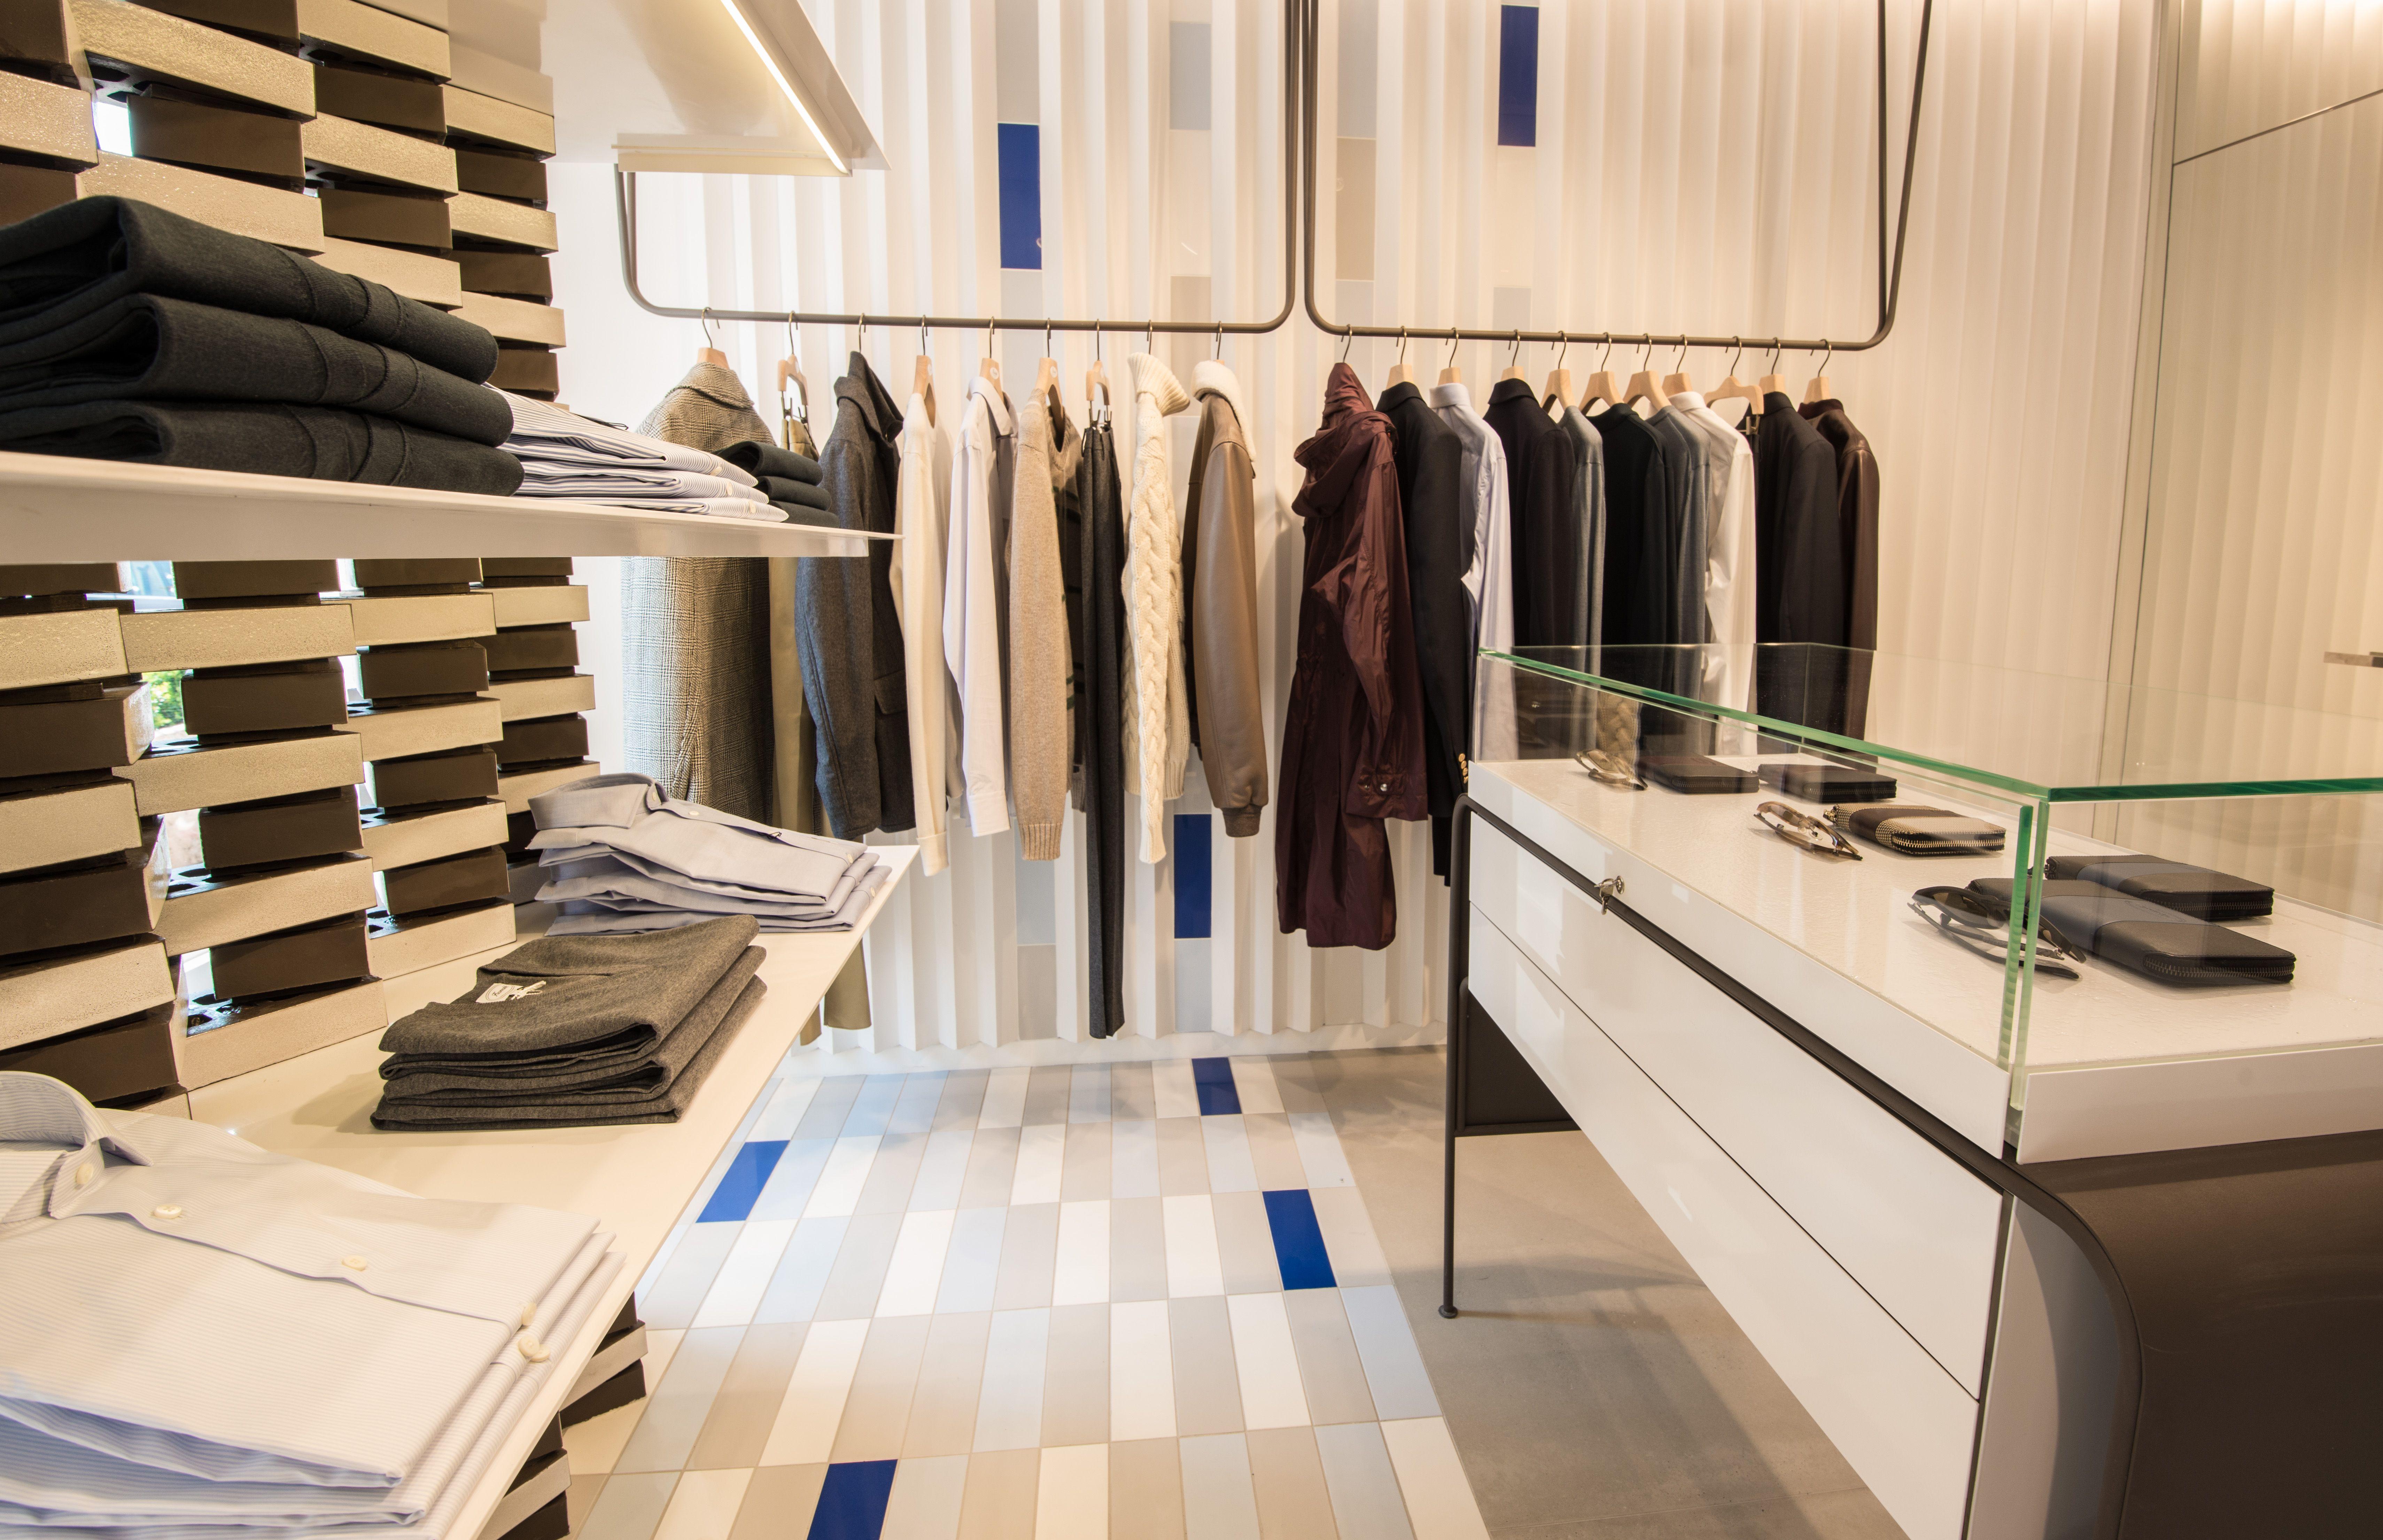 Discover the new concept store of Faconnable designed by AAarchitecture at Traverse de la Garonne, 83990 Saint-Tropez